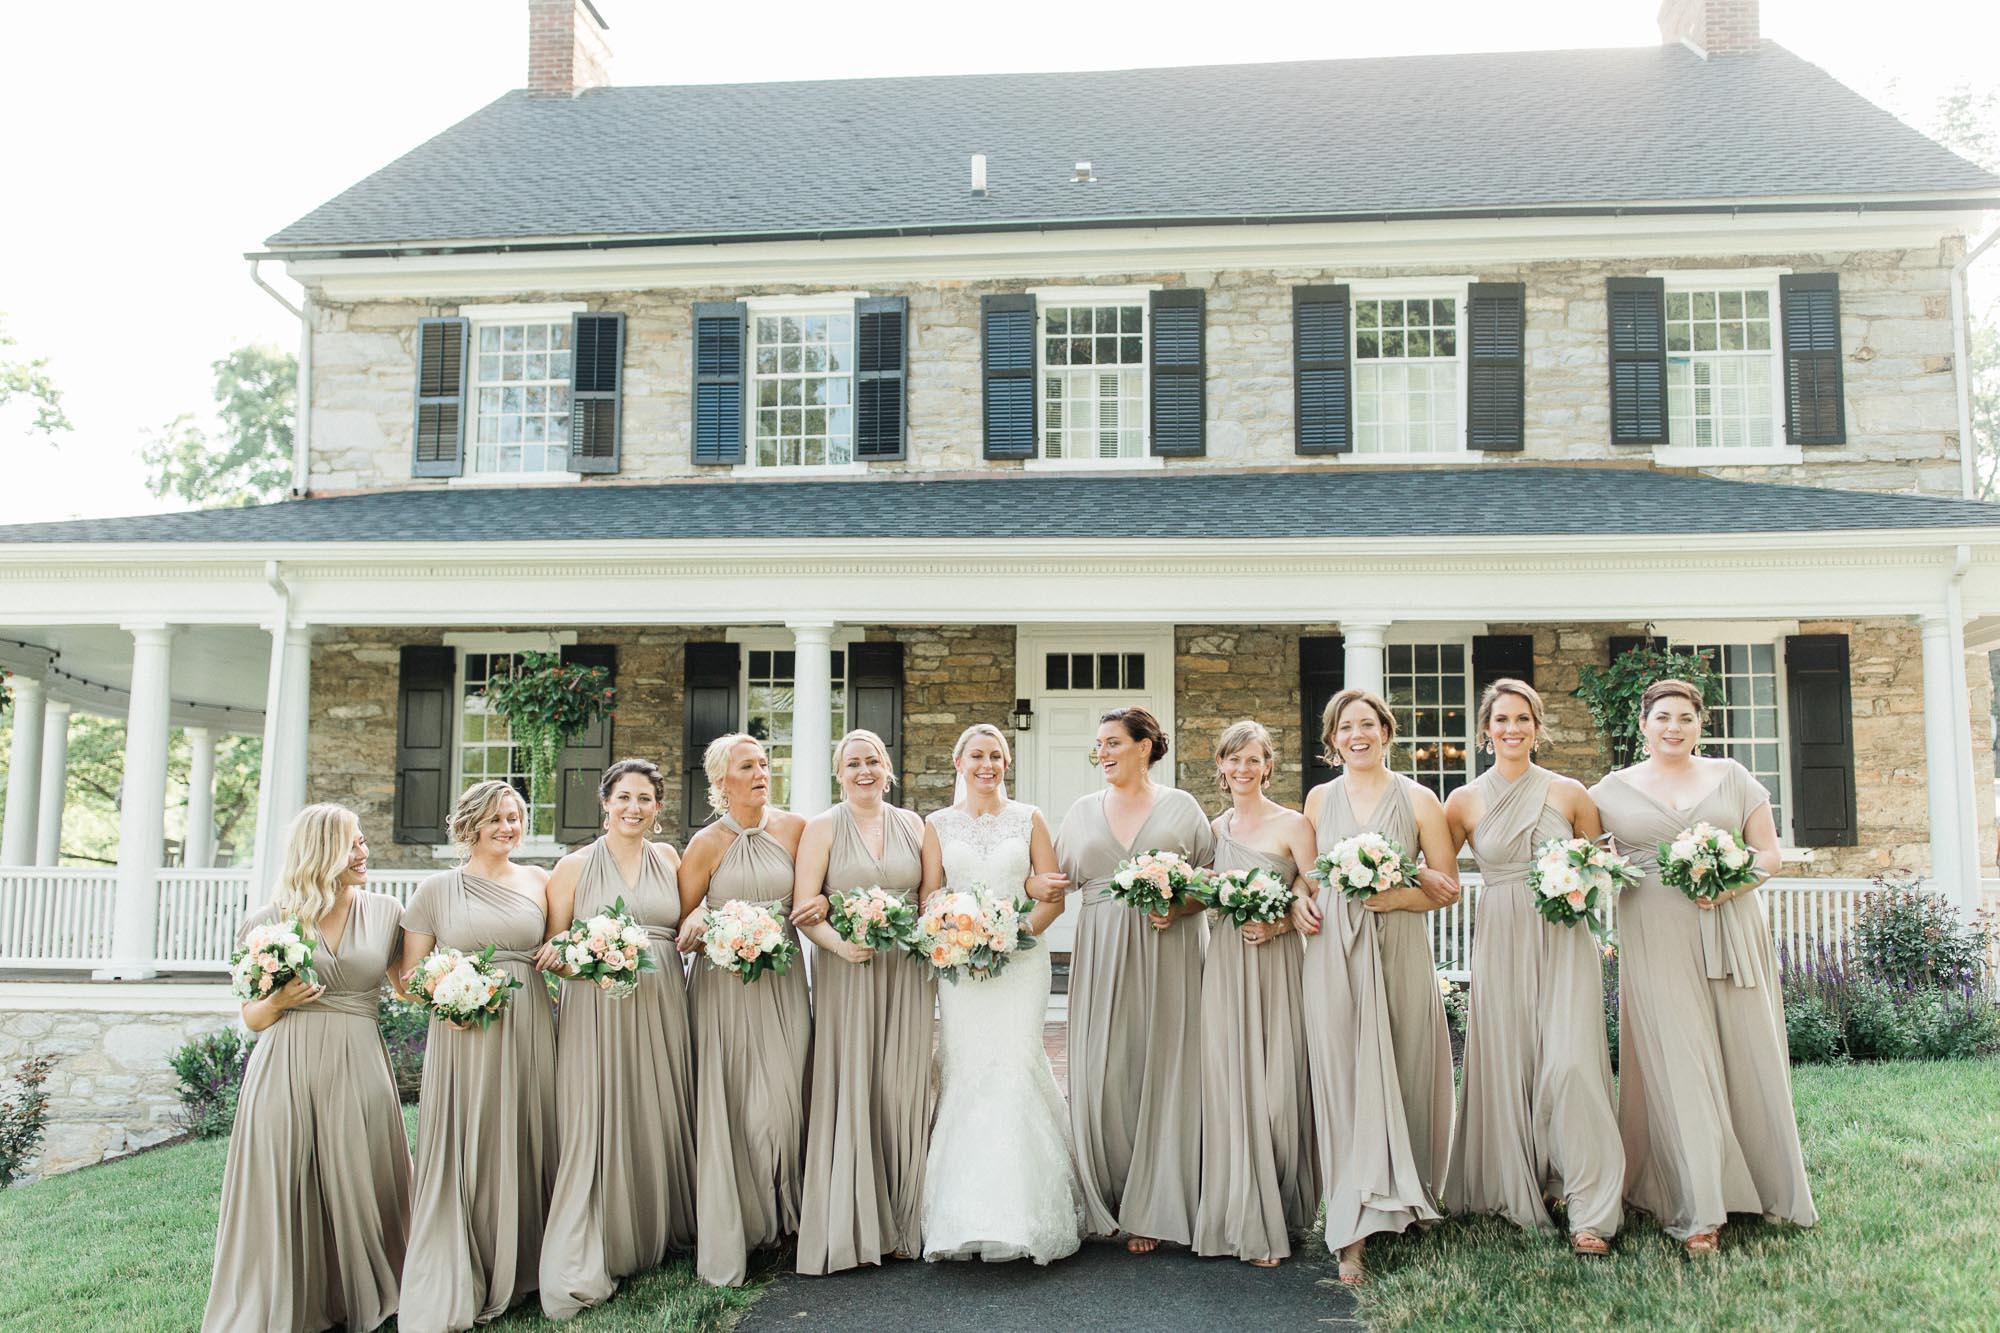 Allenberry-resort-historic-pennsylvania-wedding-10147.jpg